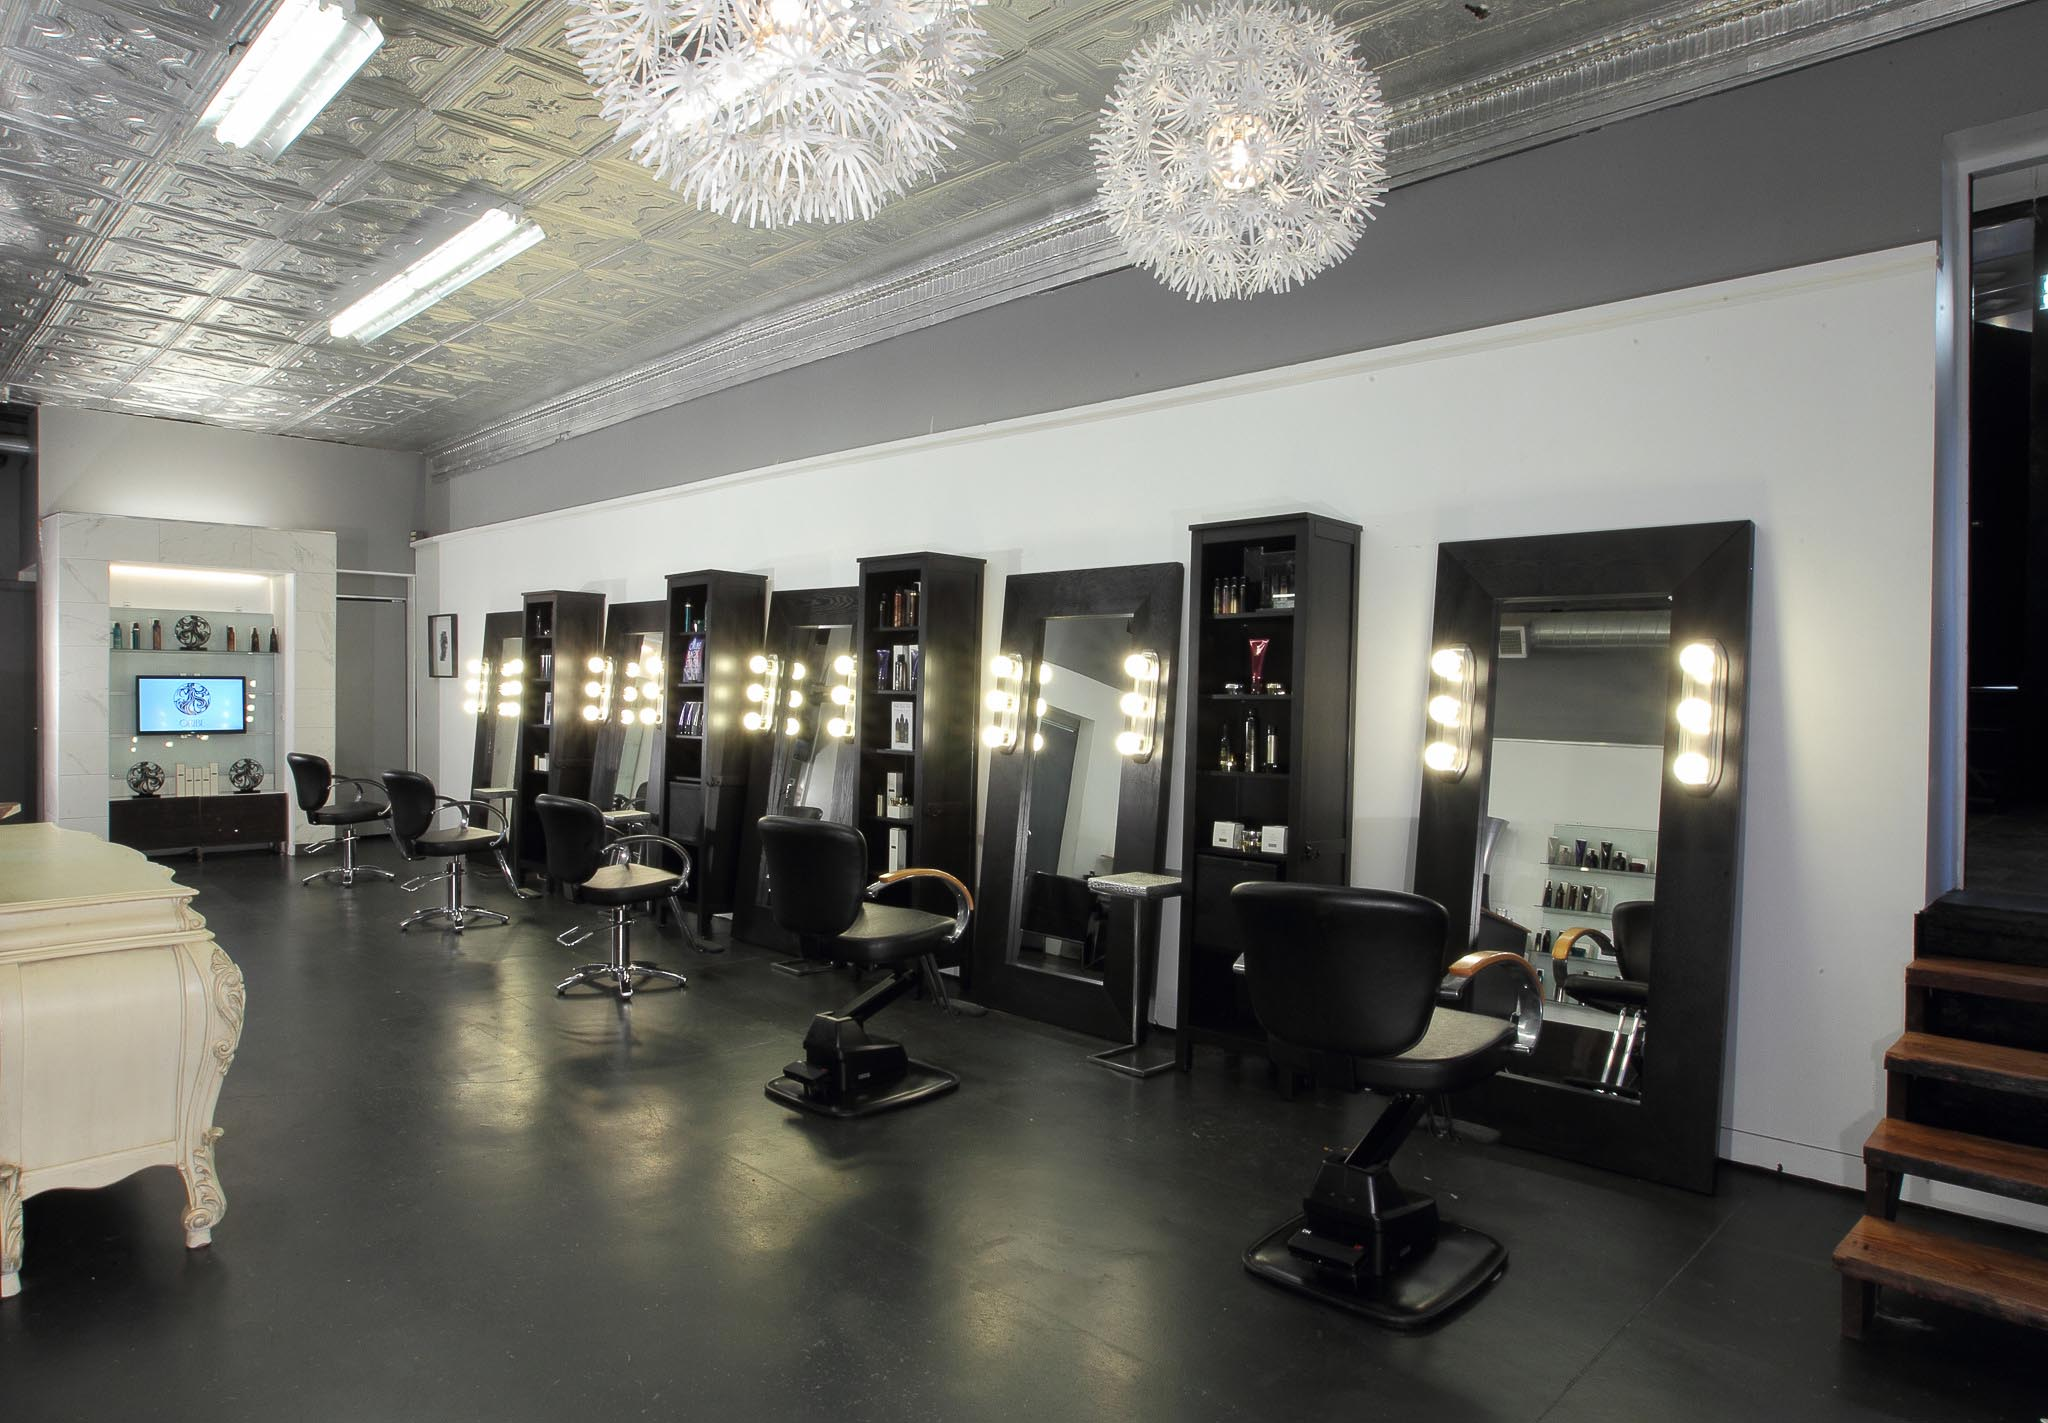 Studio oliver salon for Hair studio salon